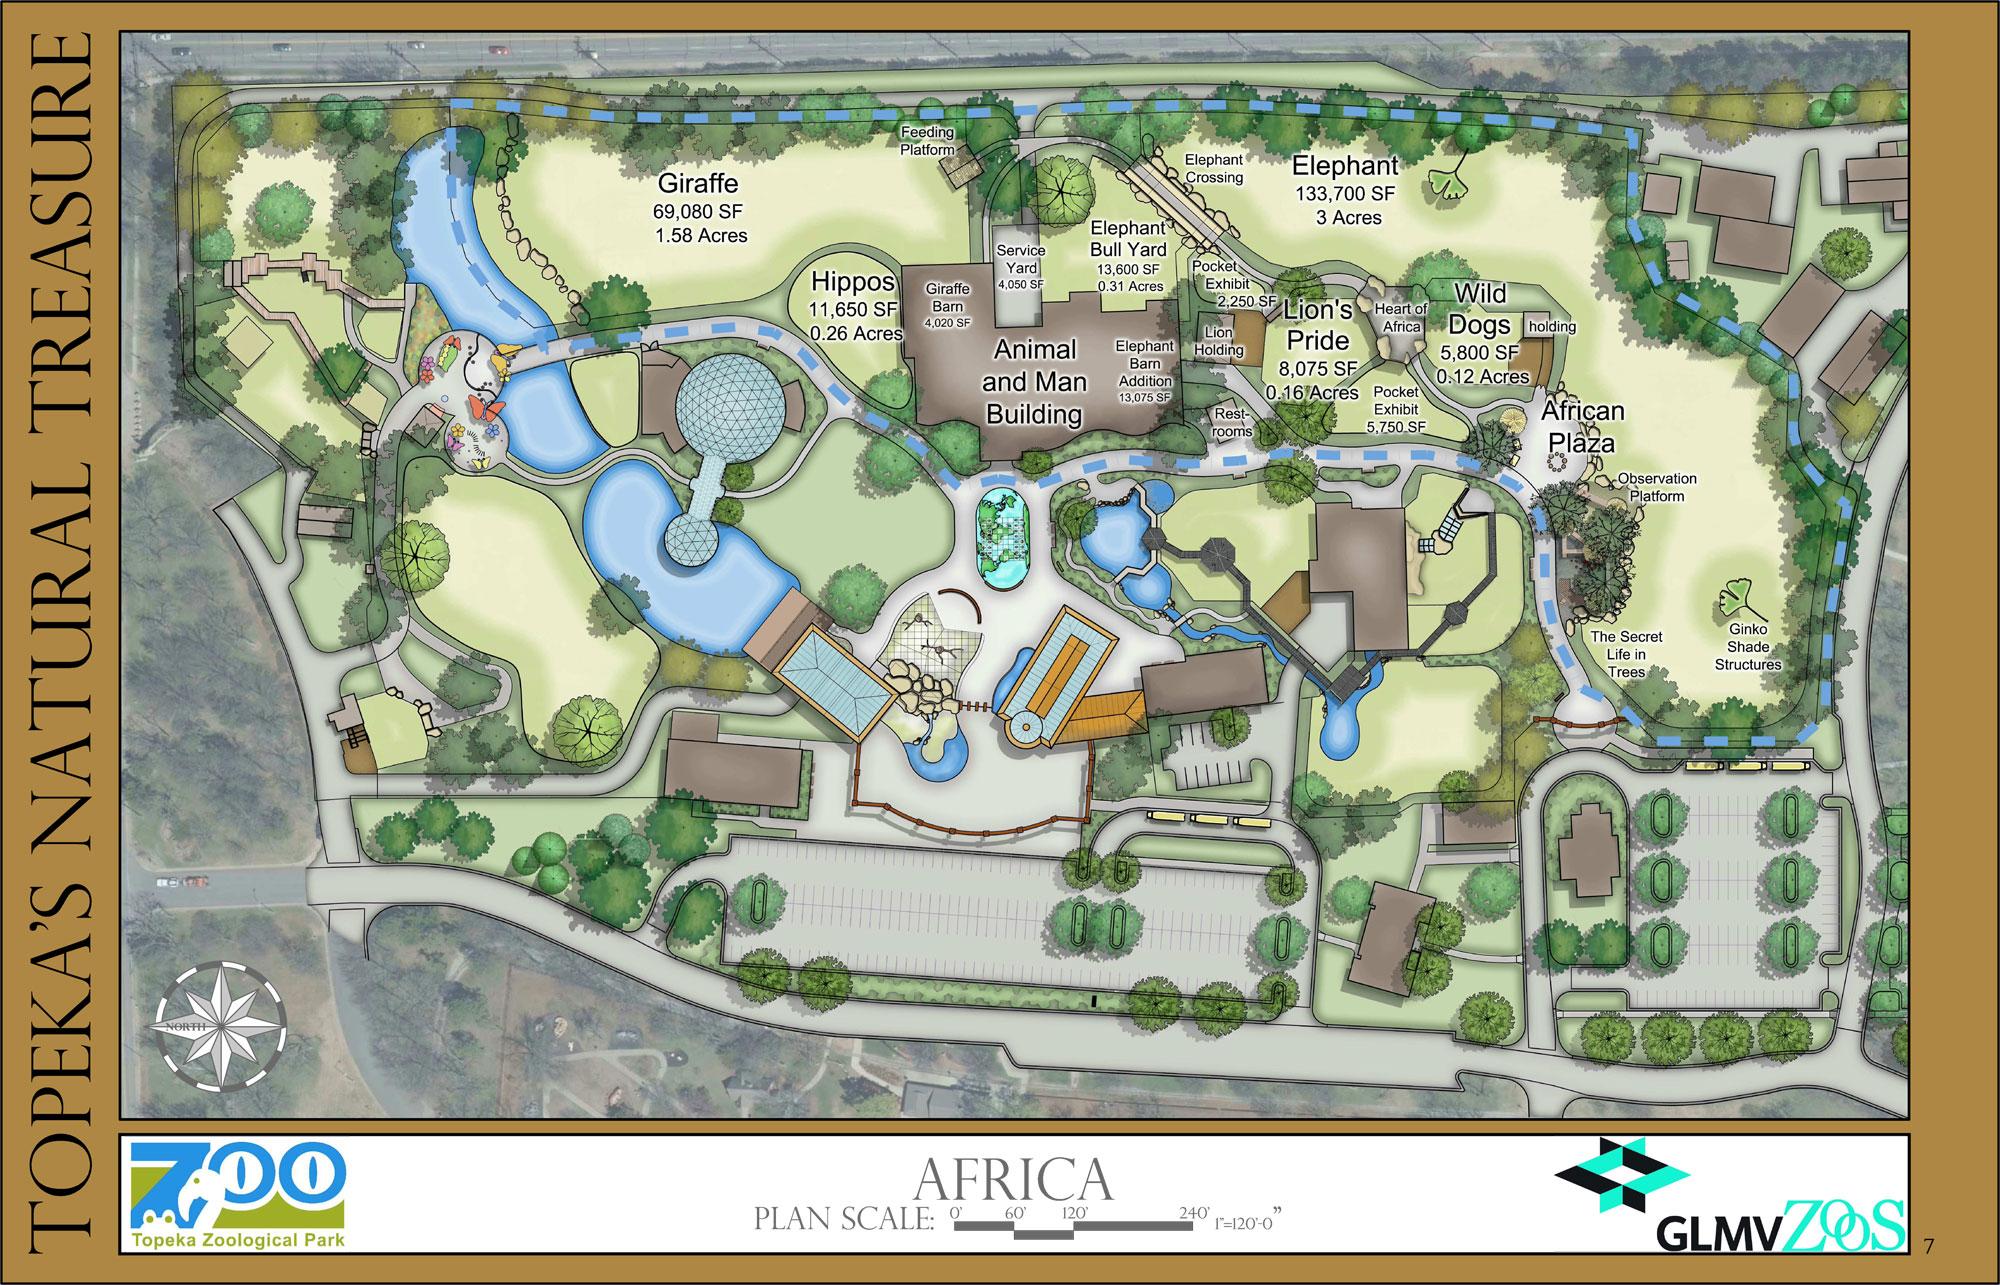 Zoo Master Plan The Topeka Zoo